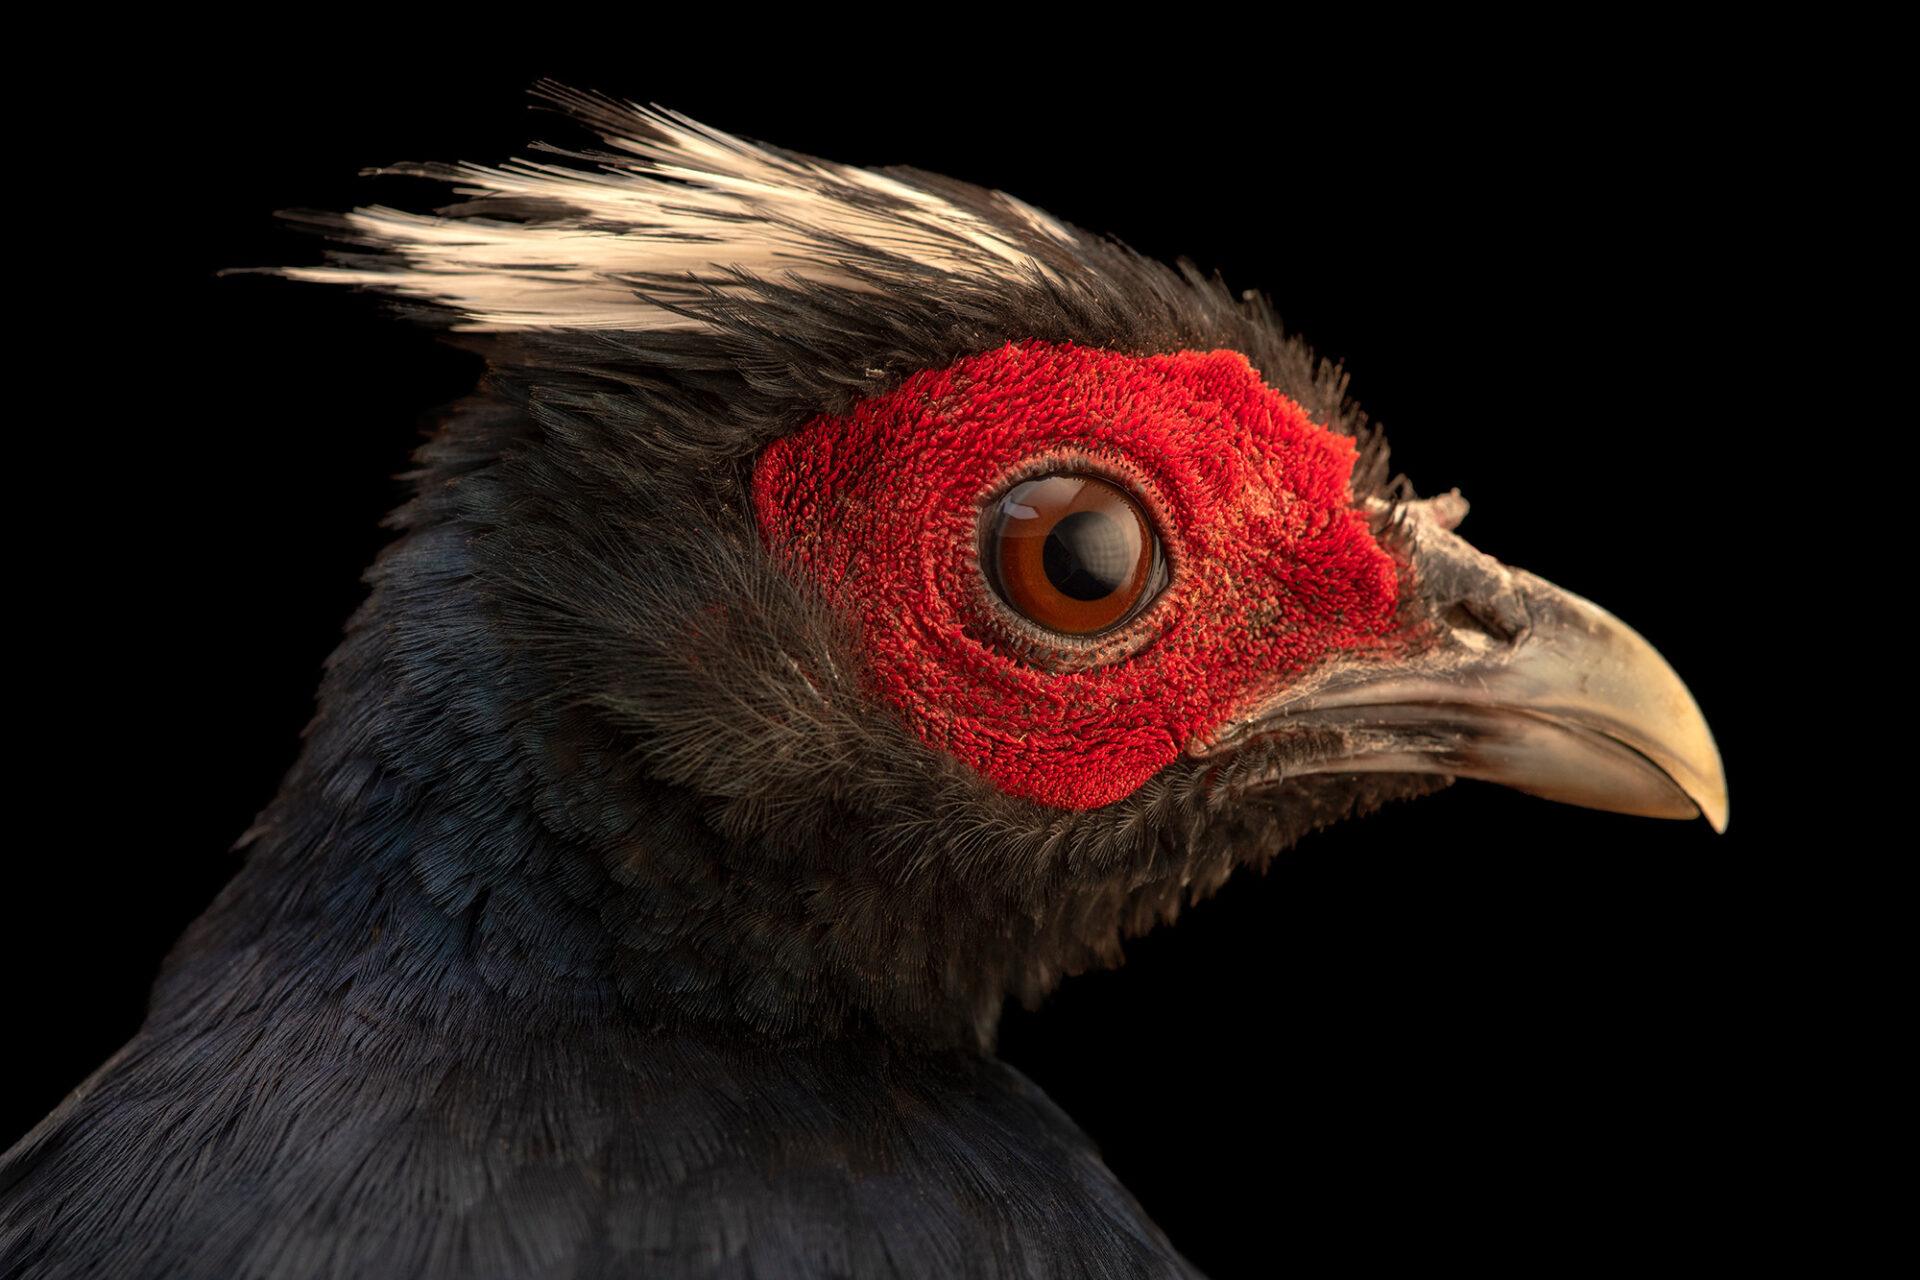 Photo: A critically endangered Edward's pheasant (Lophura edwardsi) at the Berlin Zoo.